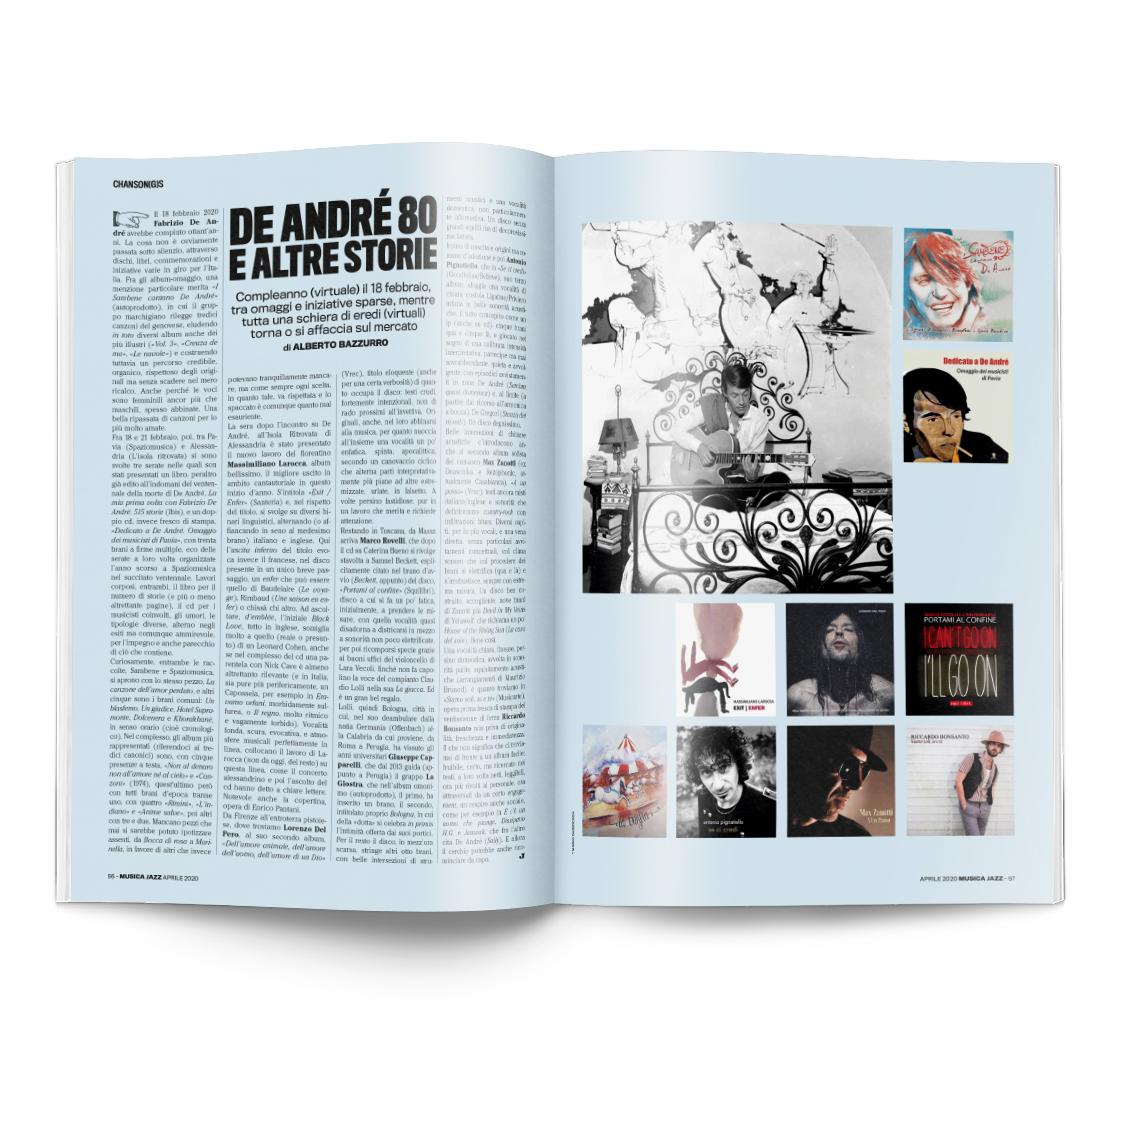 De Andrè 80 e altre storie musica Jazz aprile